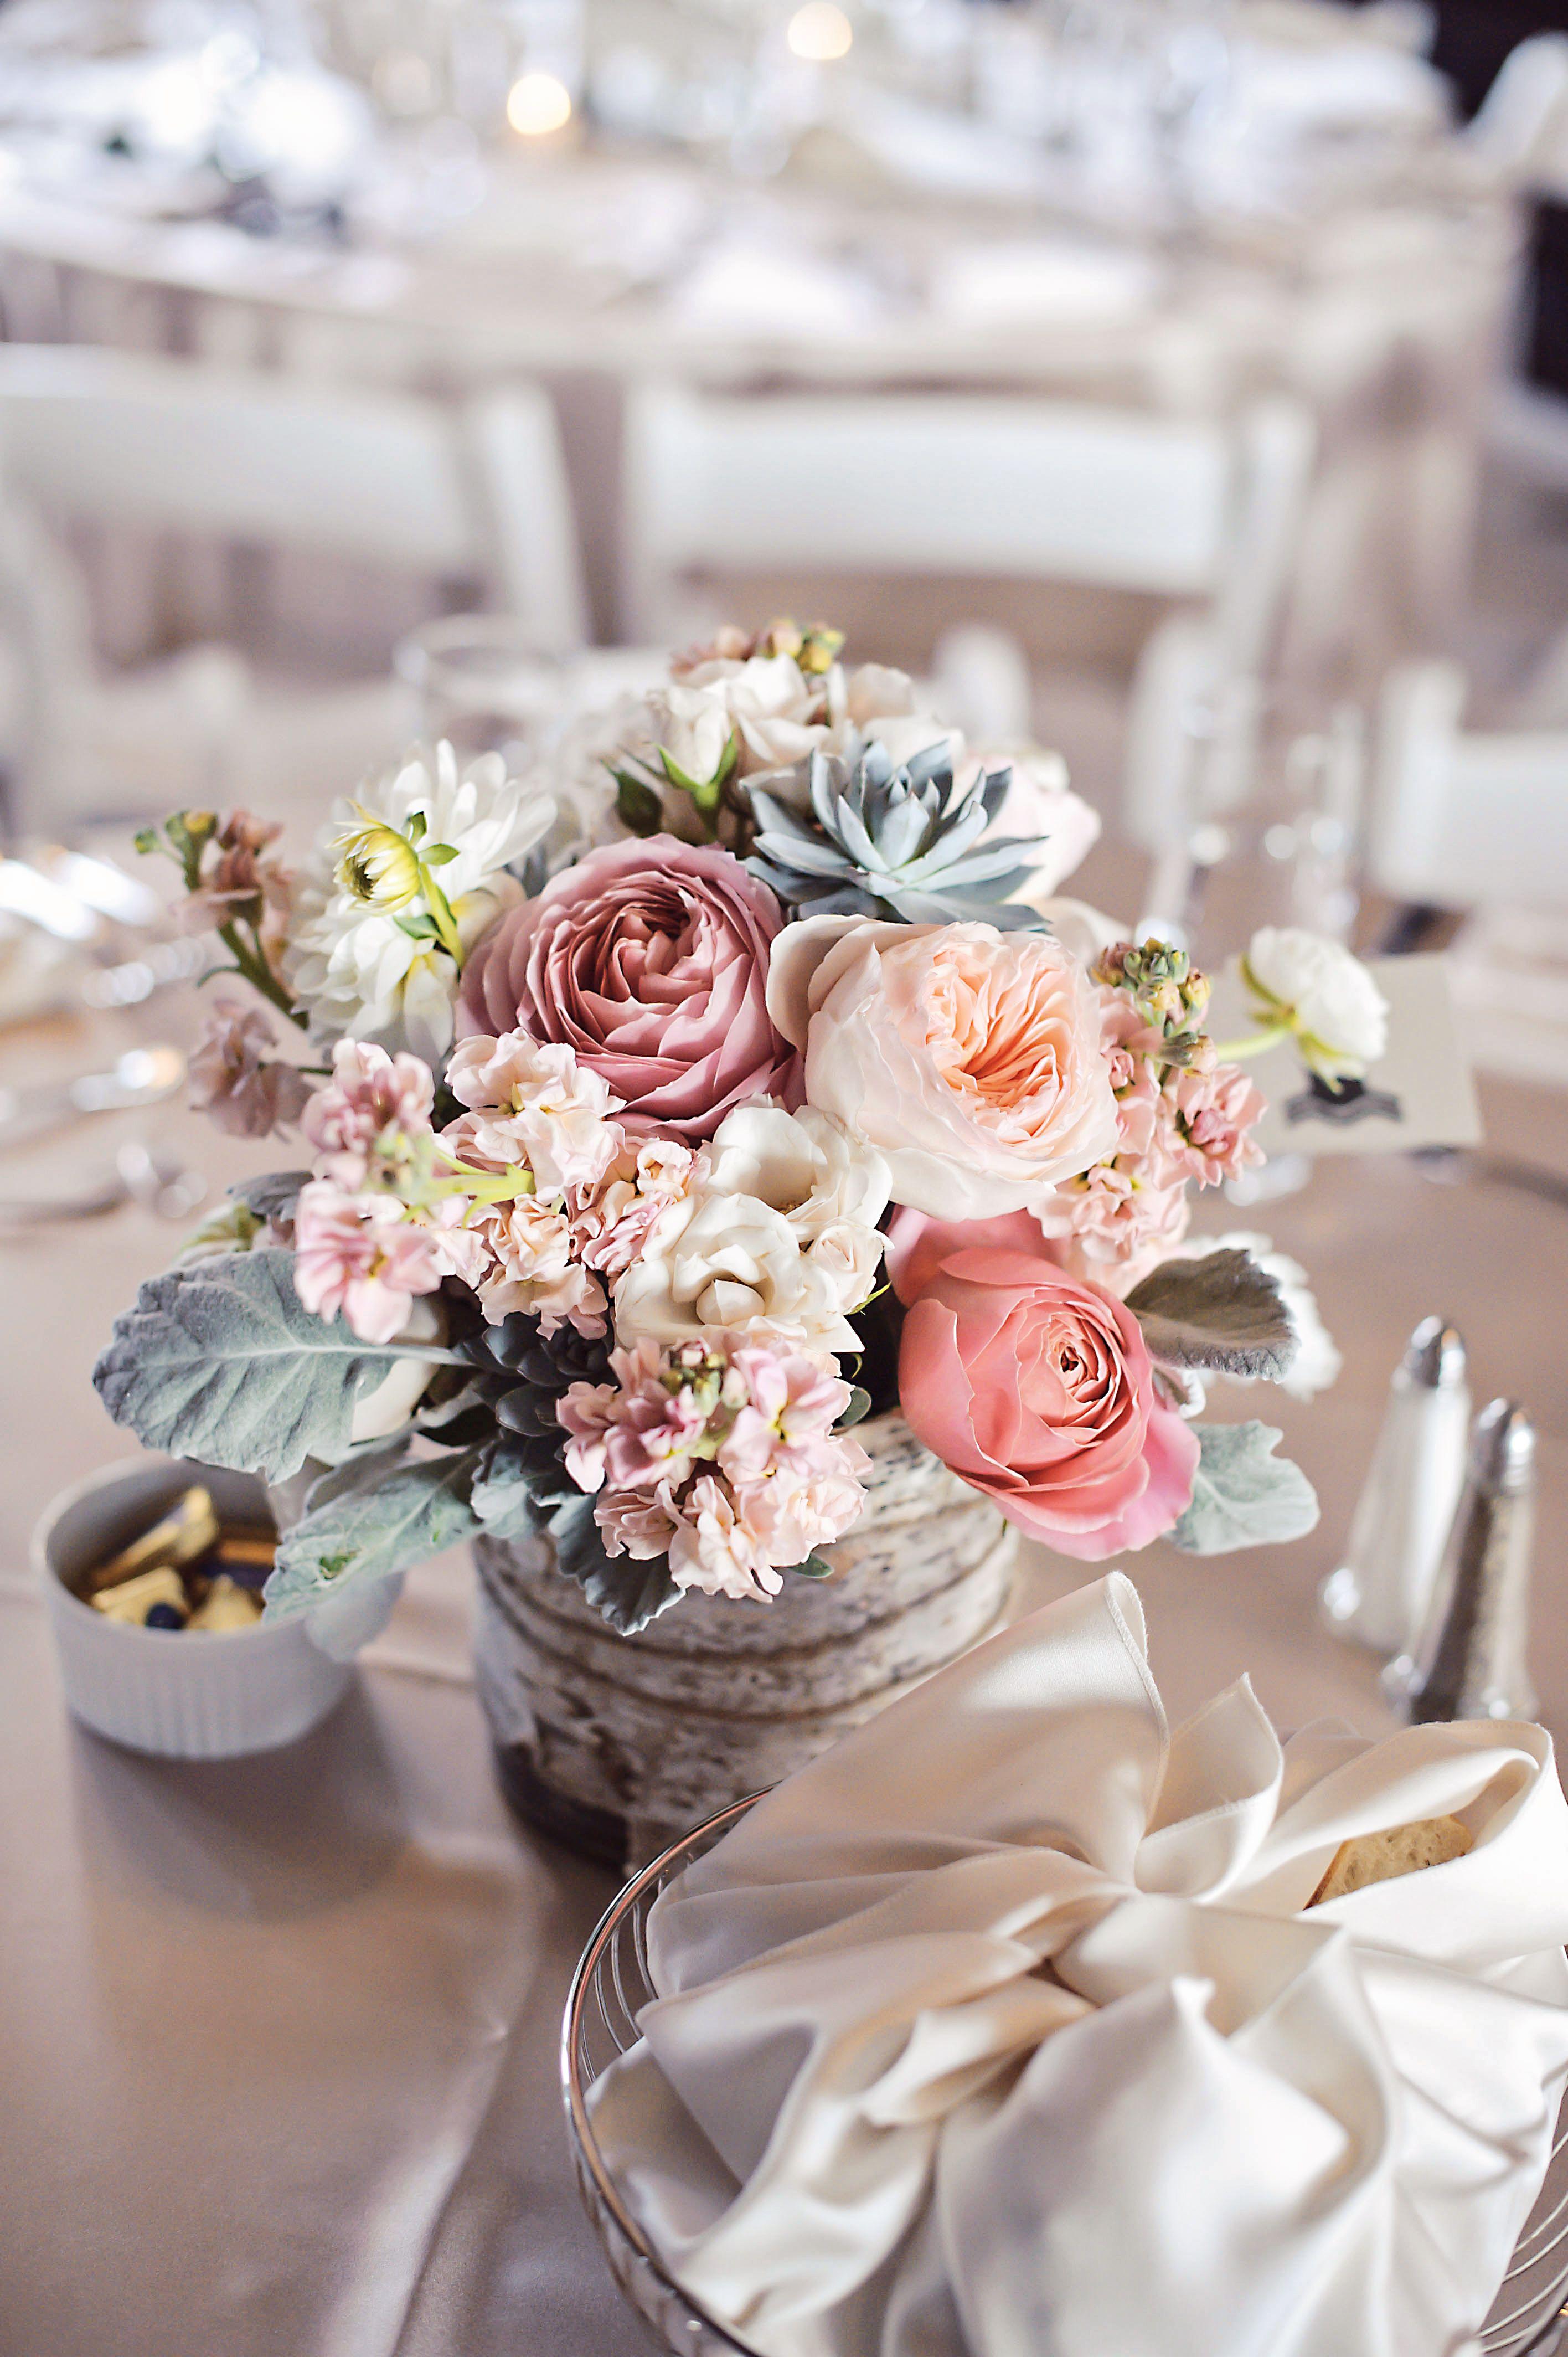 azalea floral design - centerpiece. blush pink garden roses, peach